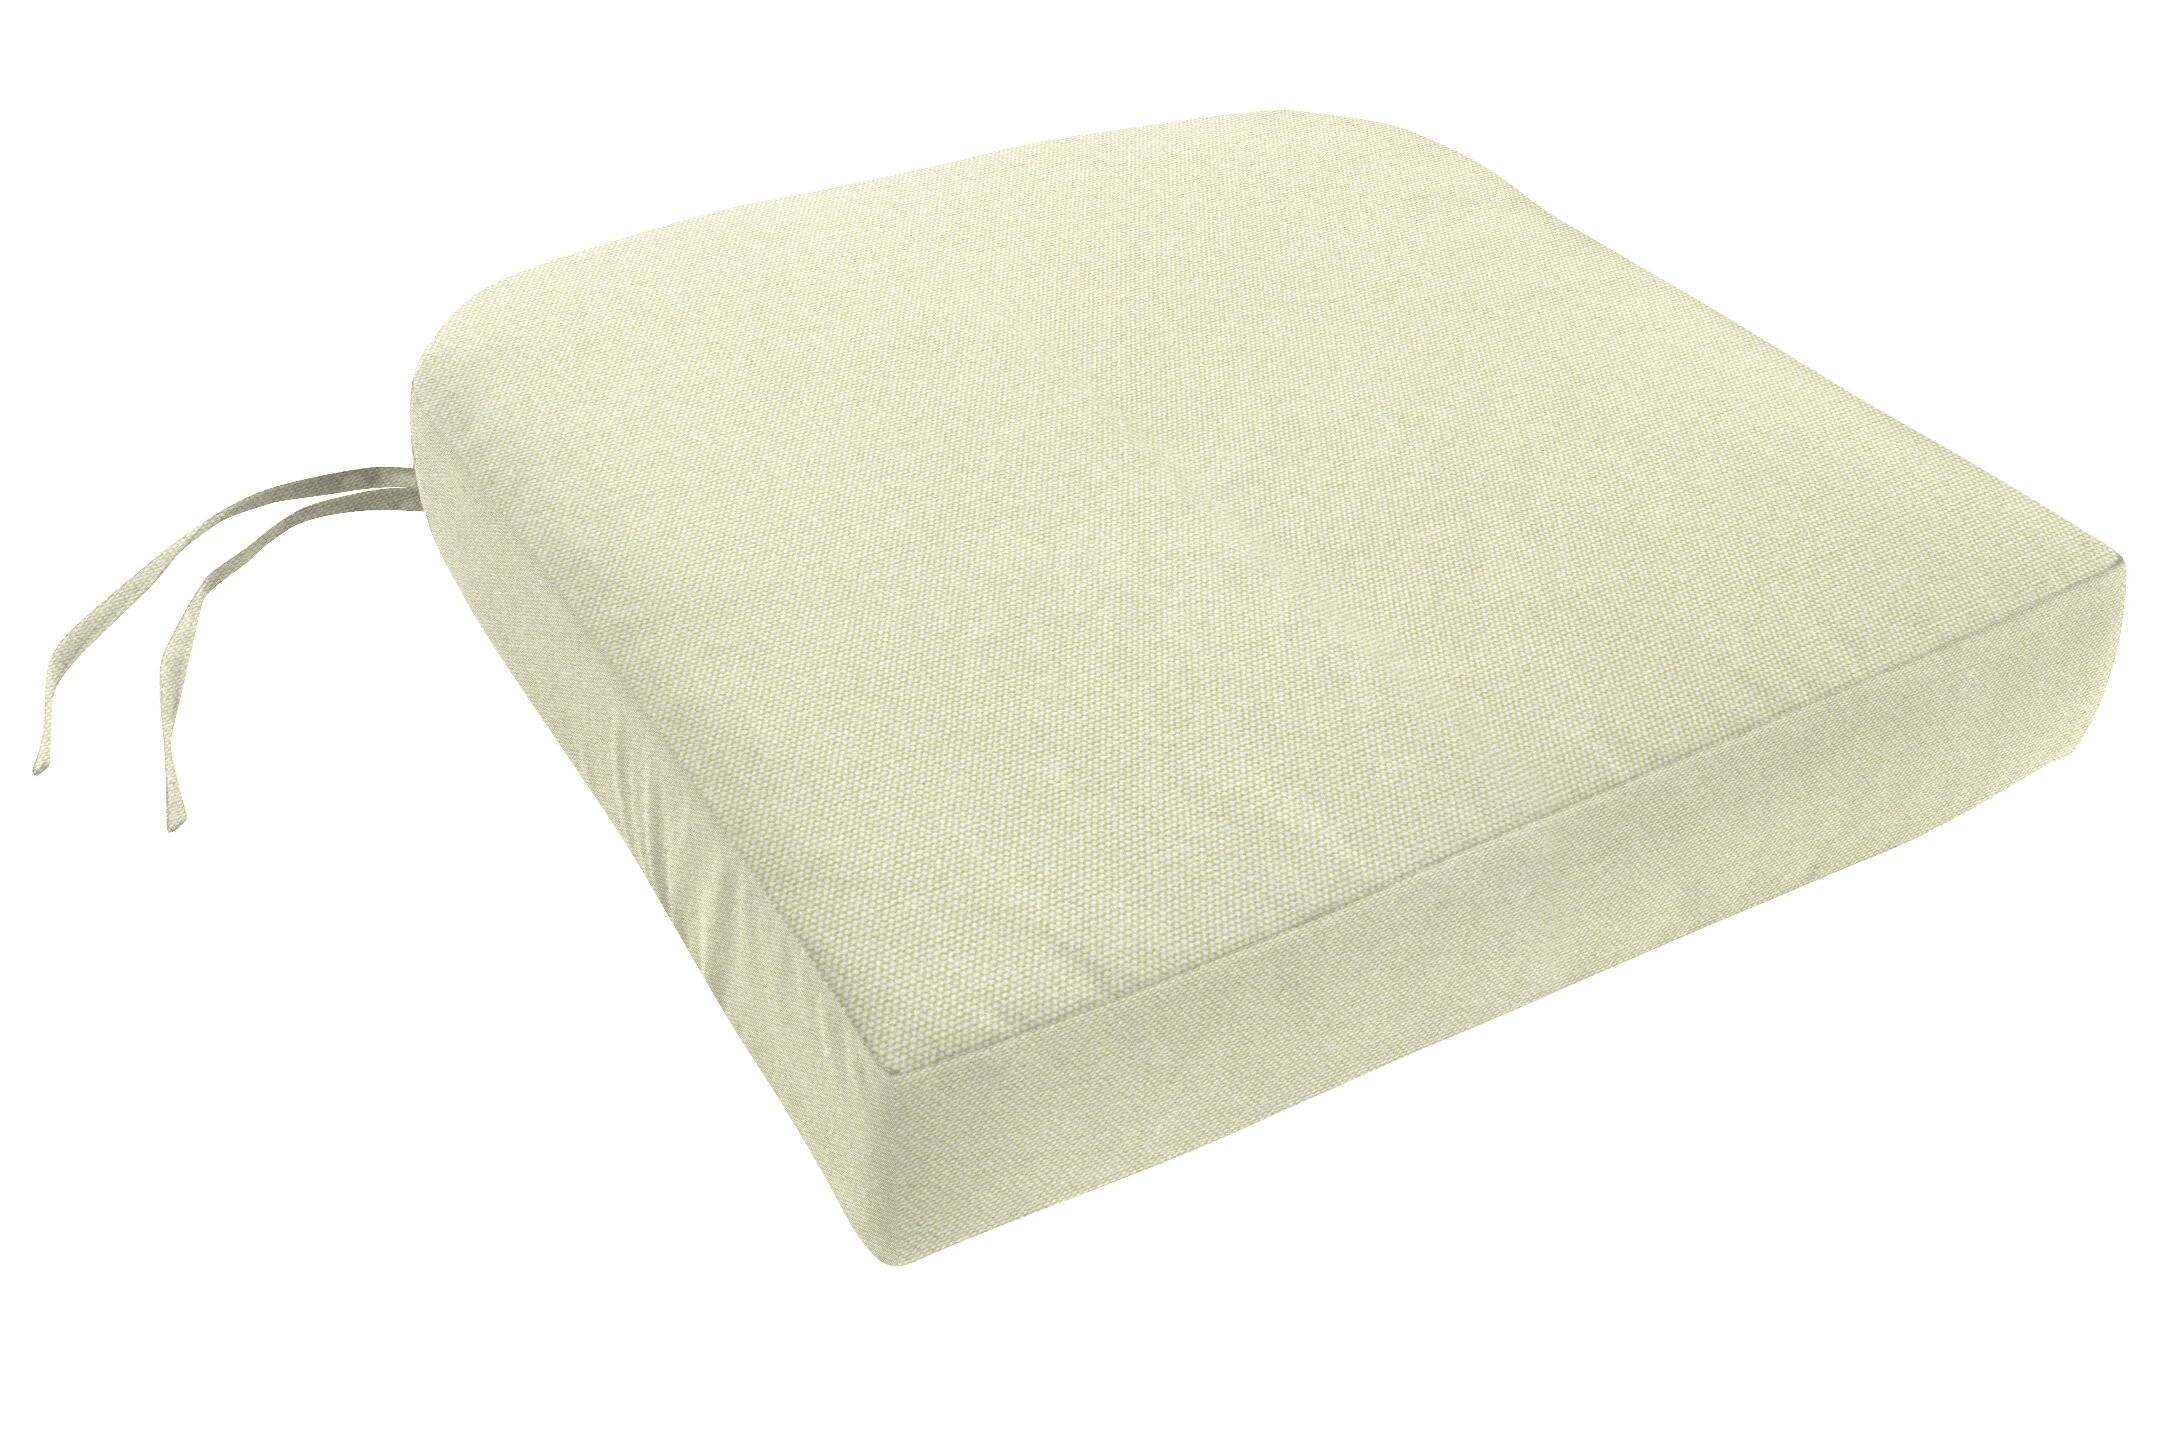 Easy Way Products Indoor Outdoor Sunbrella Seat Cushion Reviews Perigold